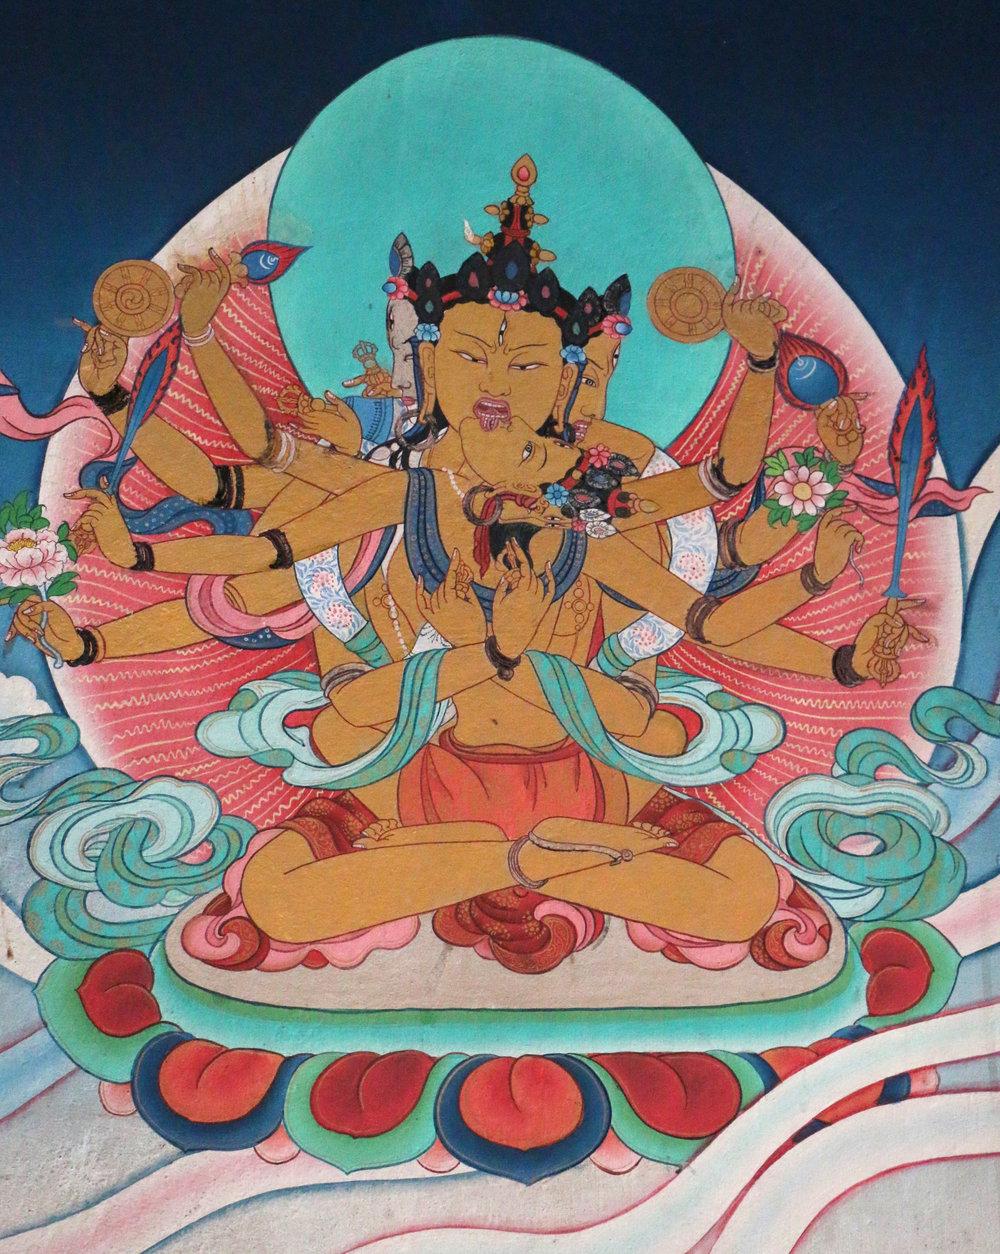 Sangdu Mekyu Dorje